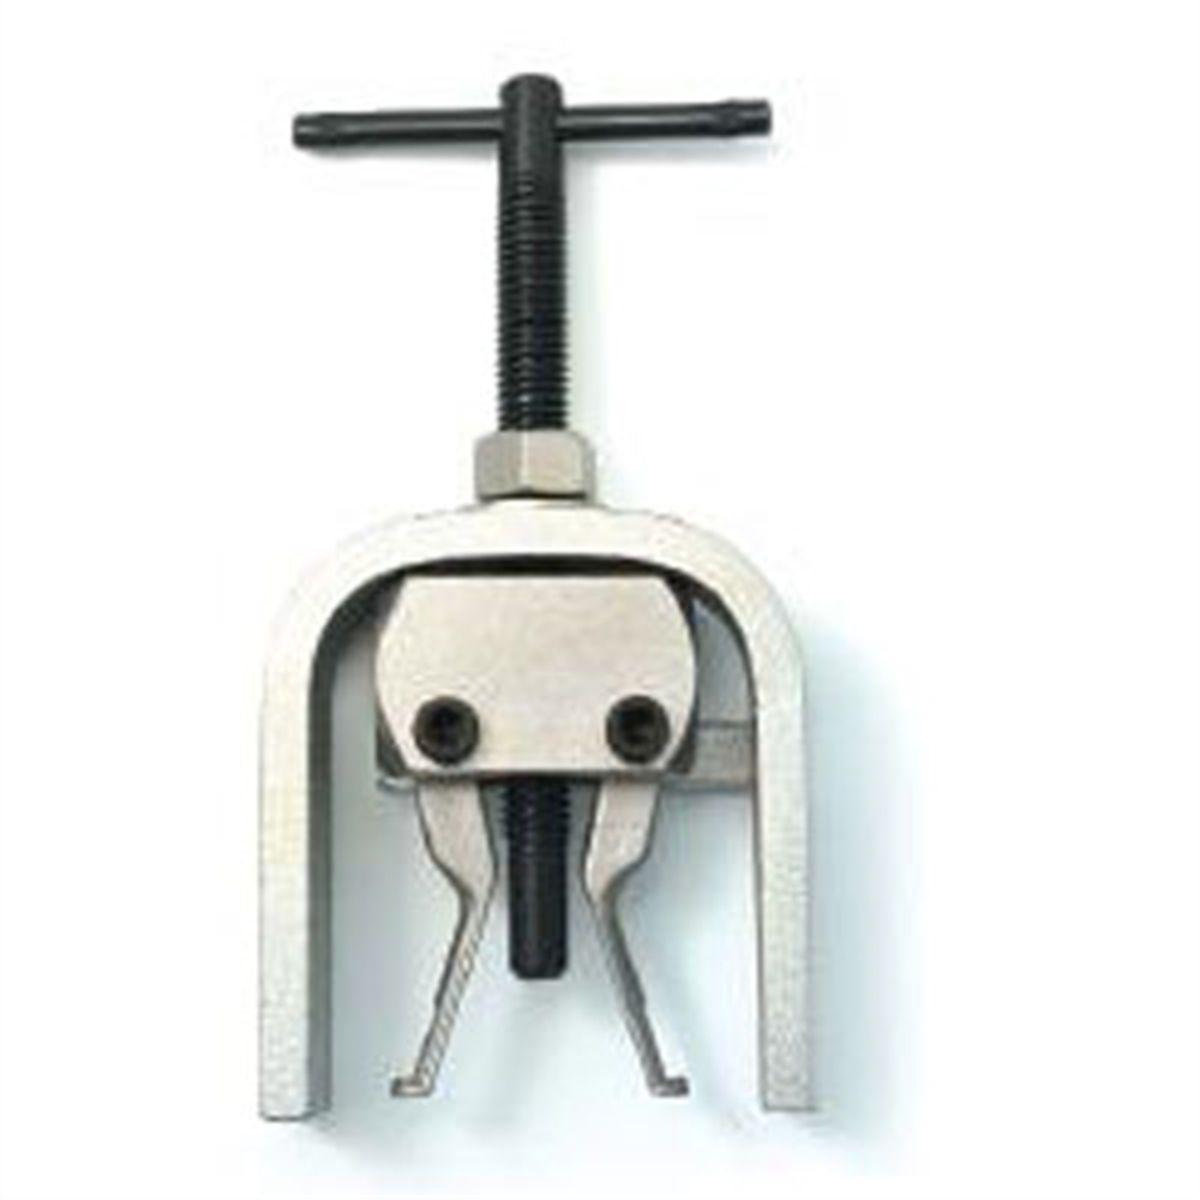 Bearing Pullers Images : Pilot bearing puller